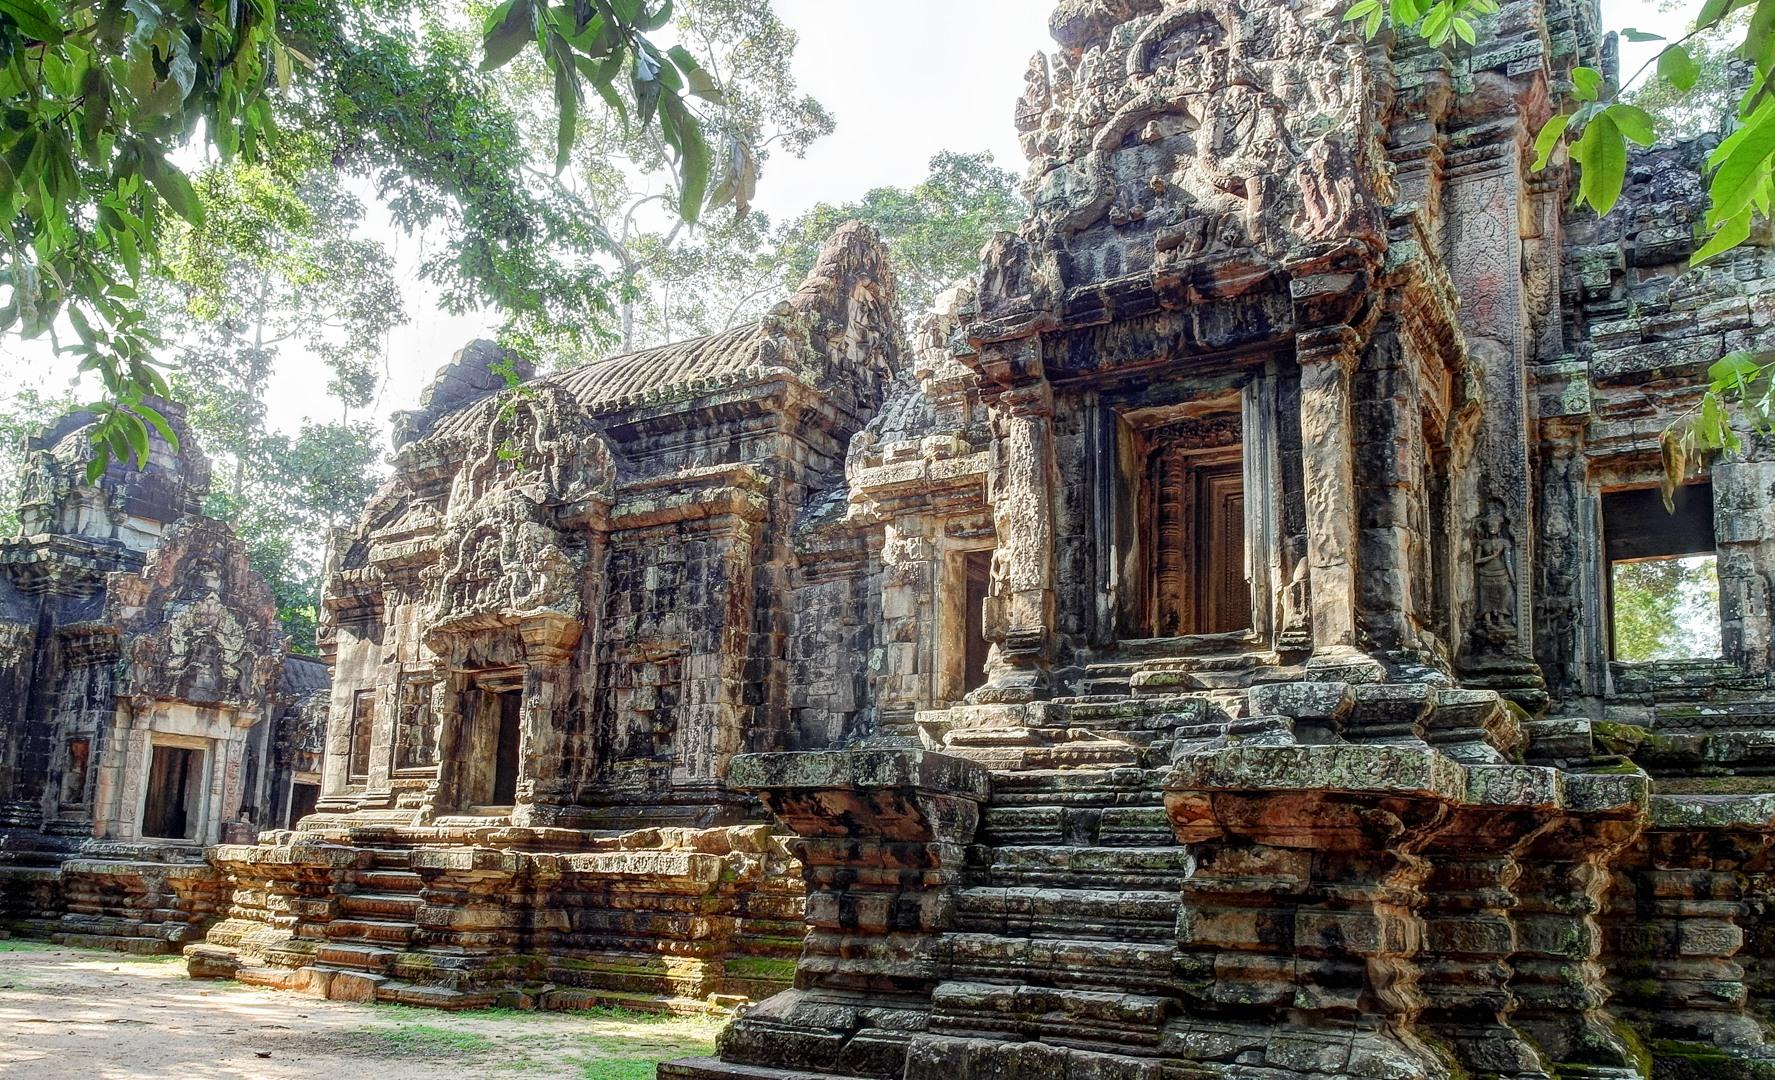 Храм Чау Сей Тевода (Chau Say Tevoda Temple), Ангкор